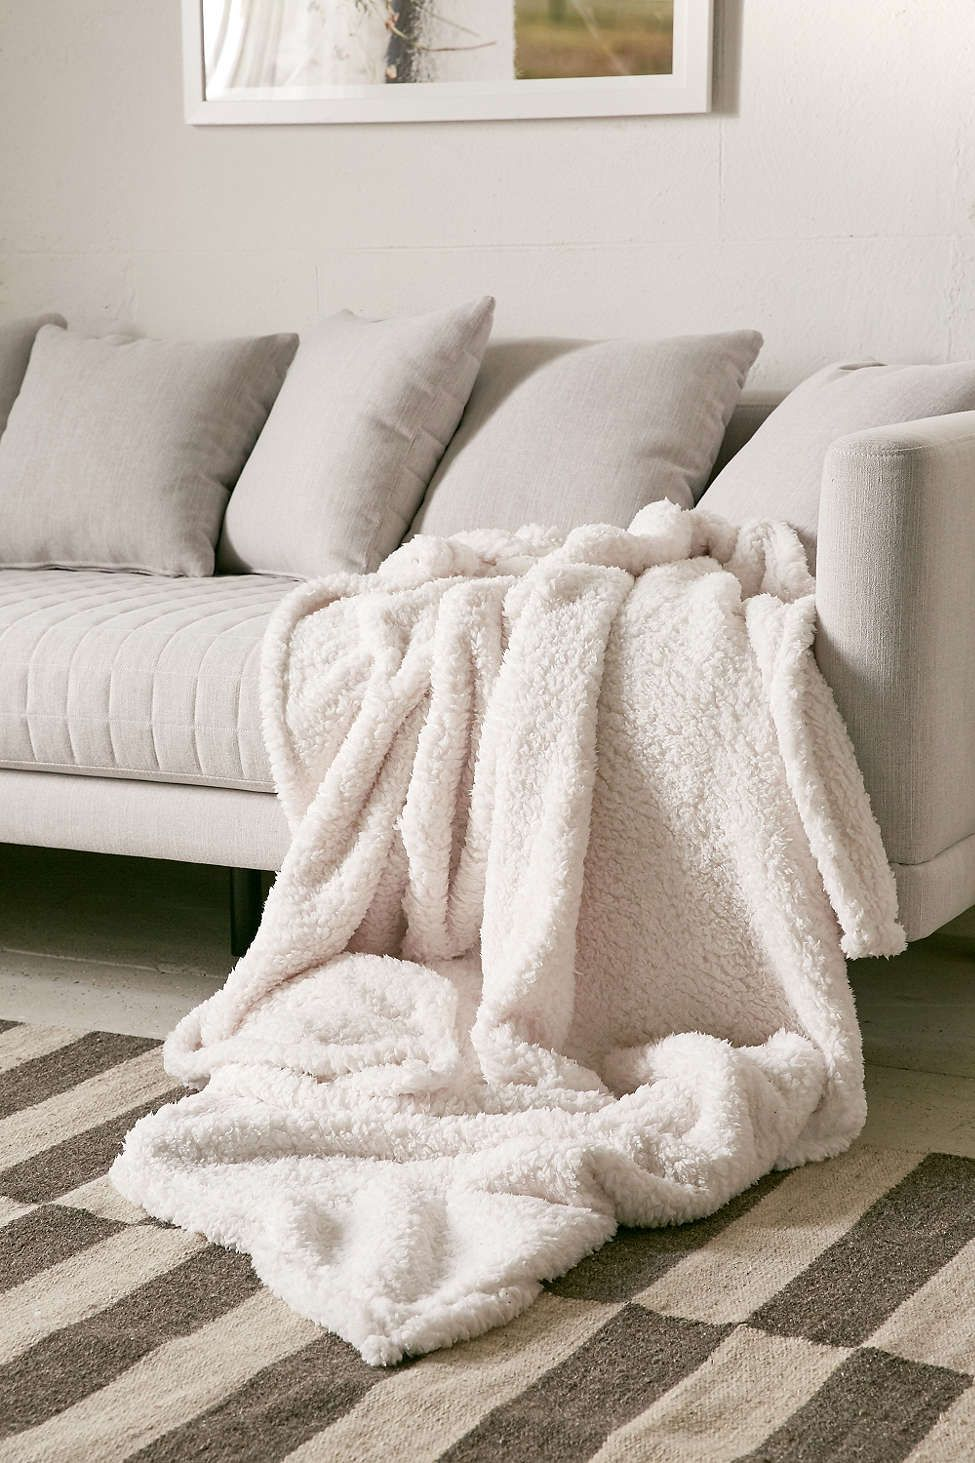 Amped Fleece Throw Blanket Fleece Throw Blanket Throw Blanket Blanket